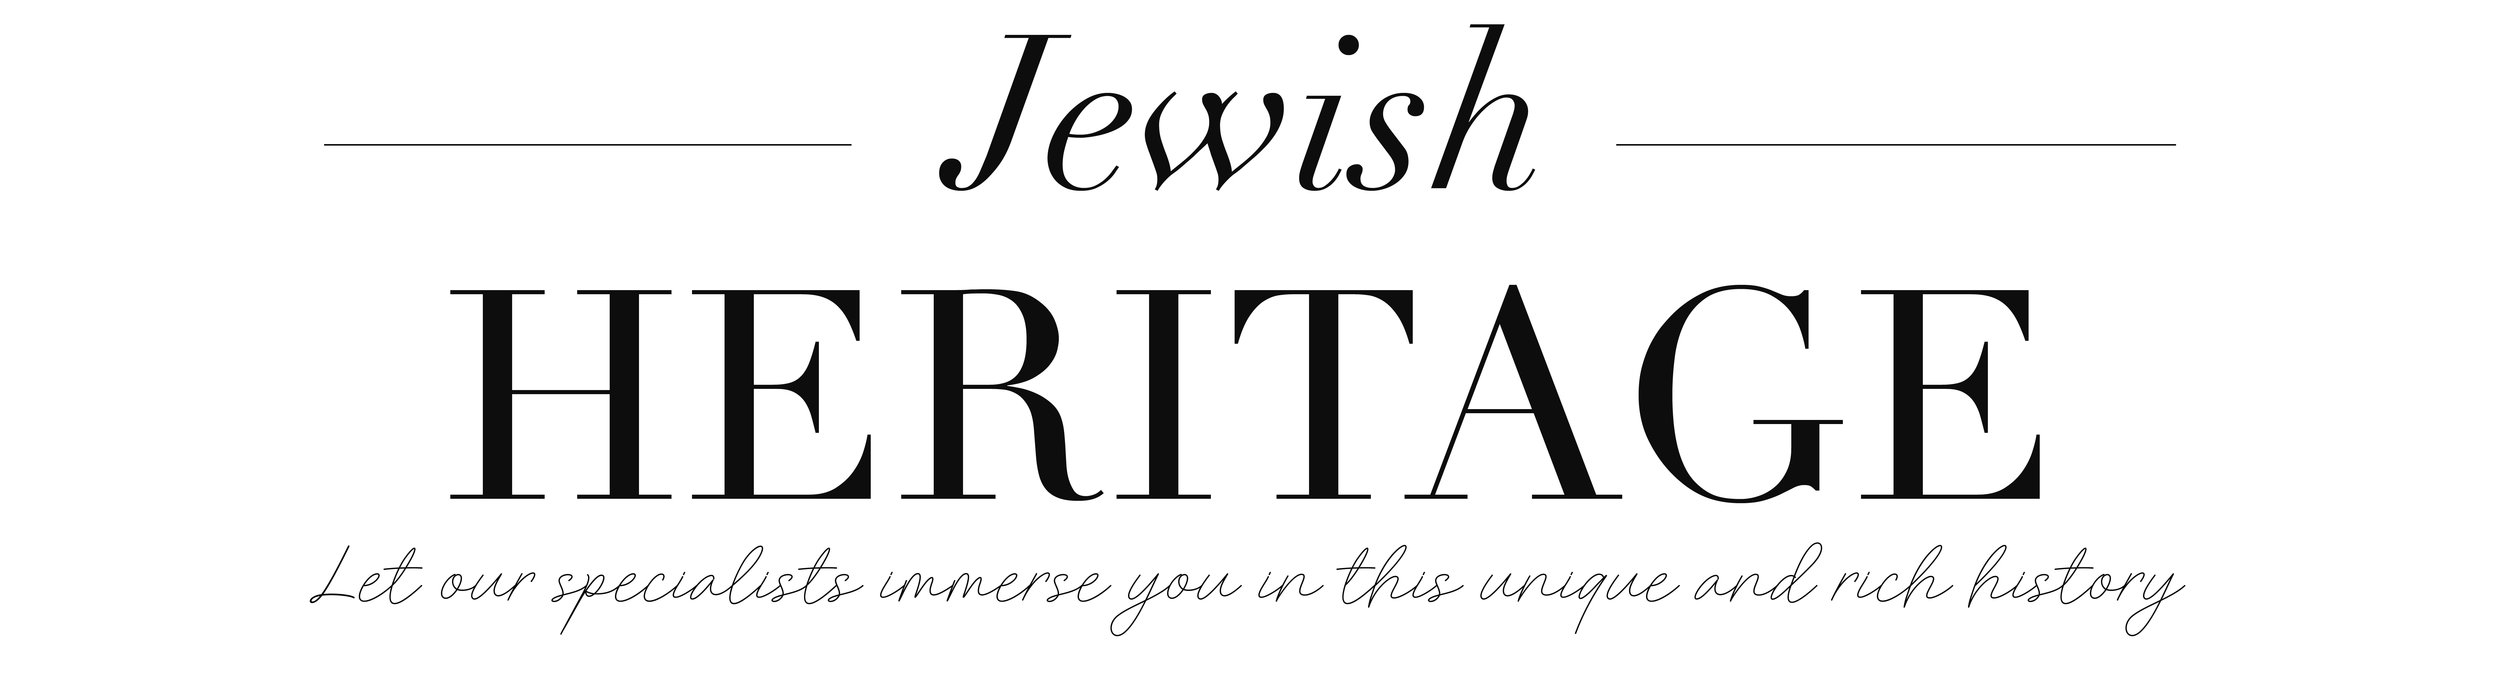 jewish heritage2.jpg